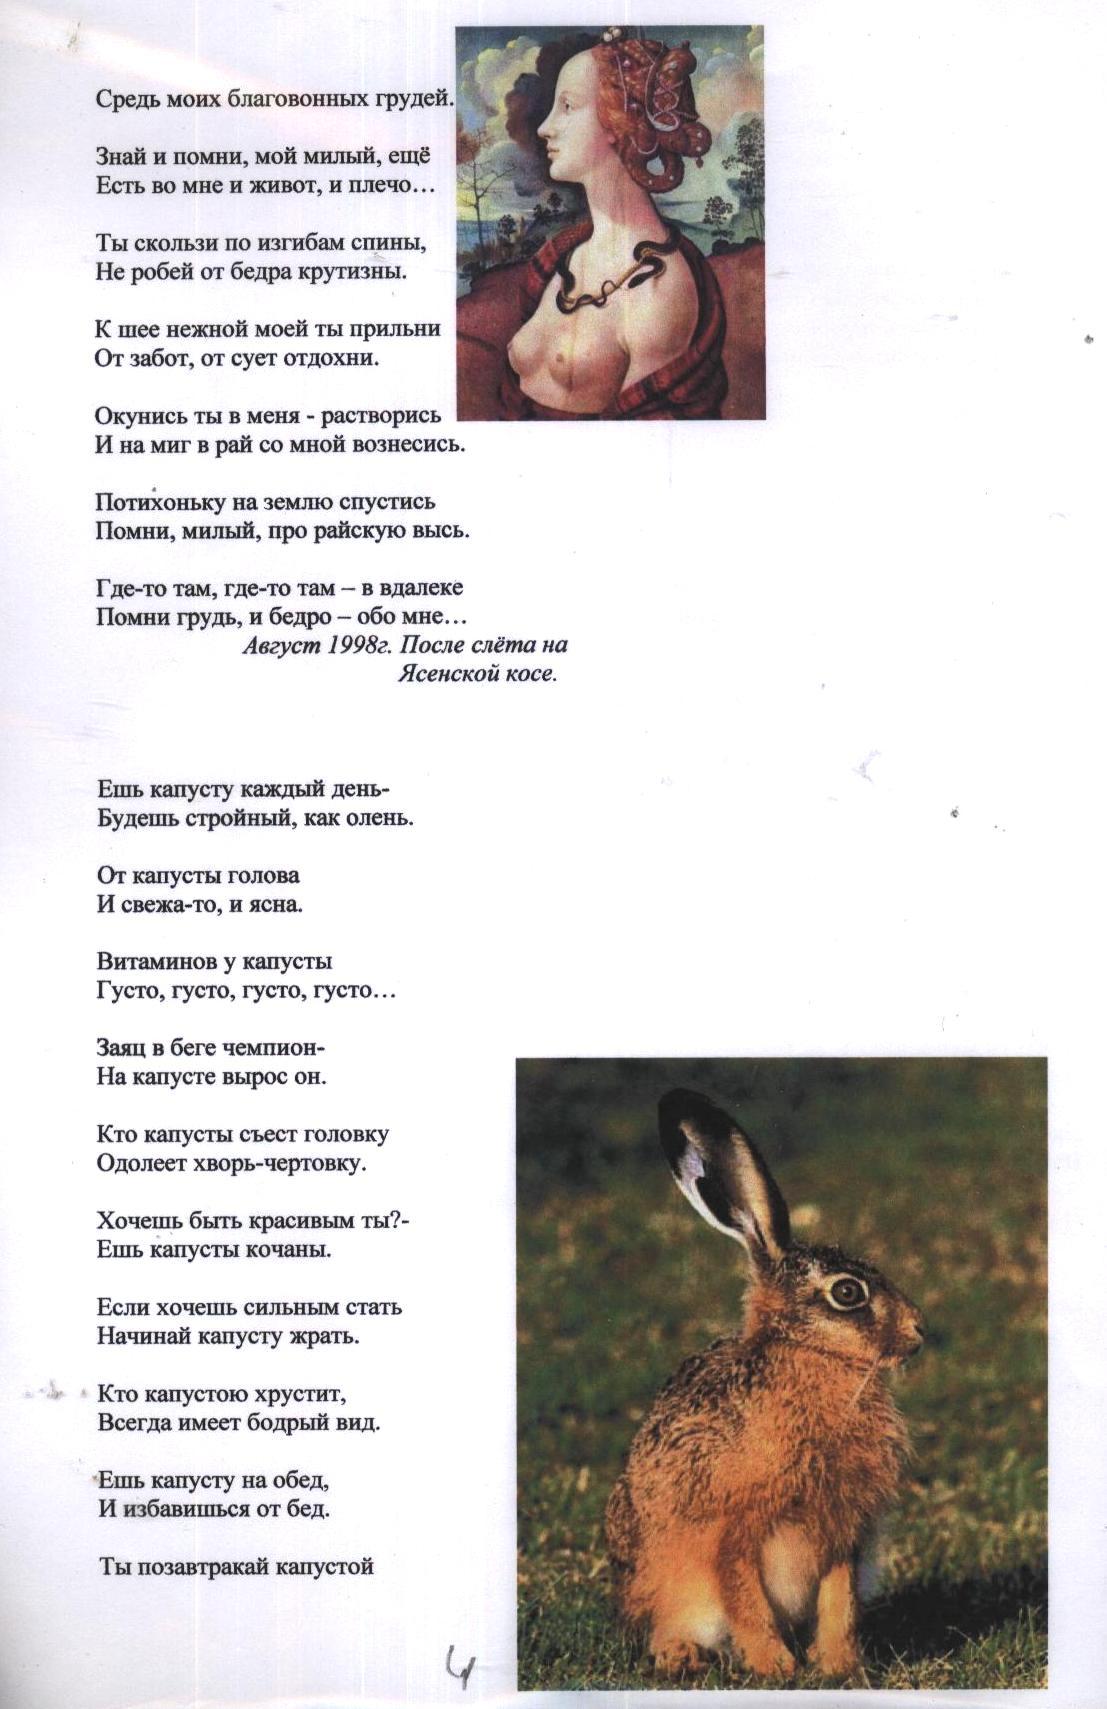 Стихи 003.jpg